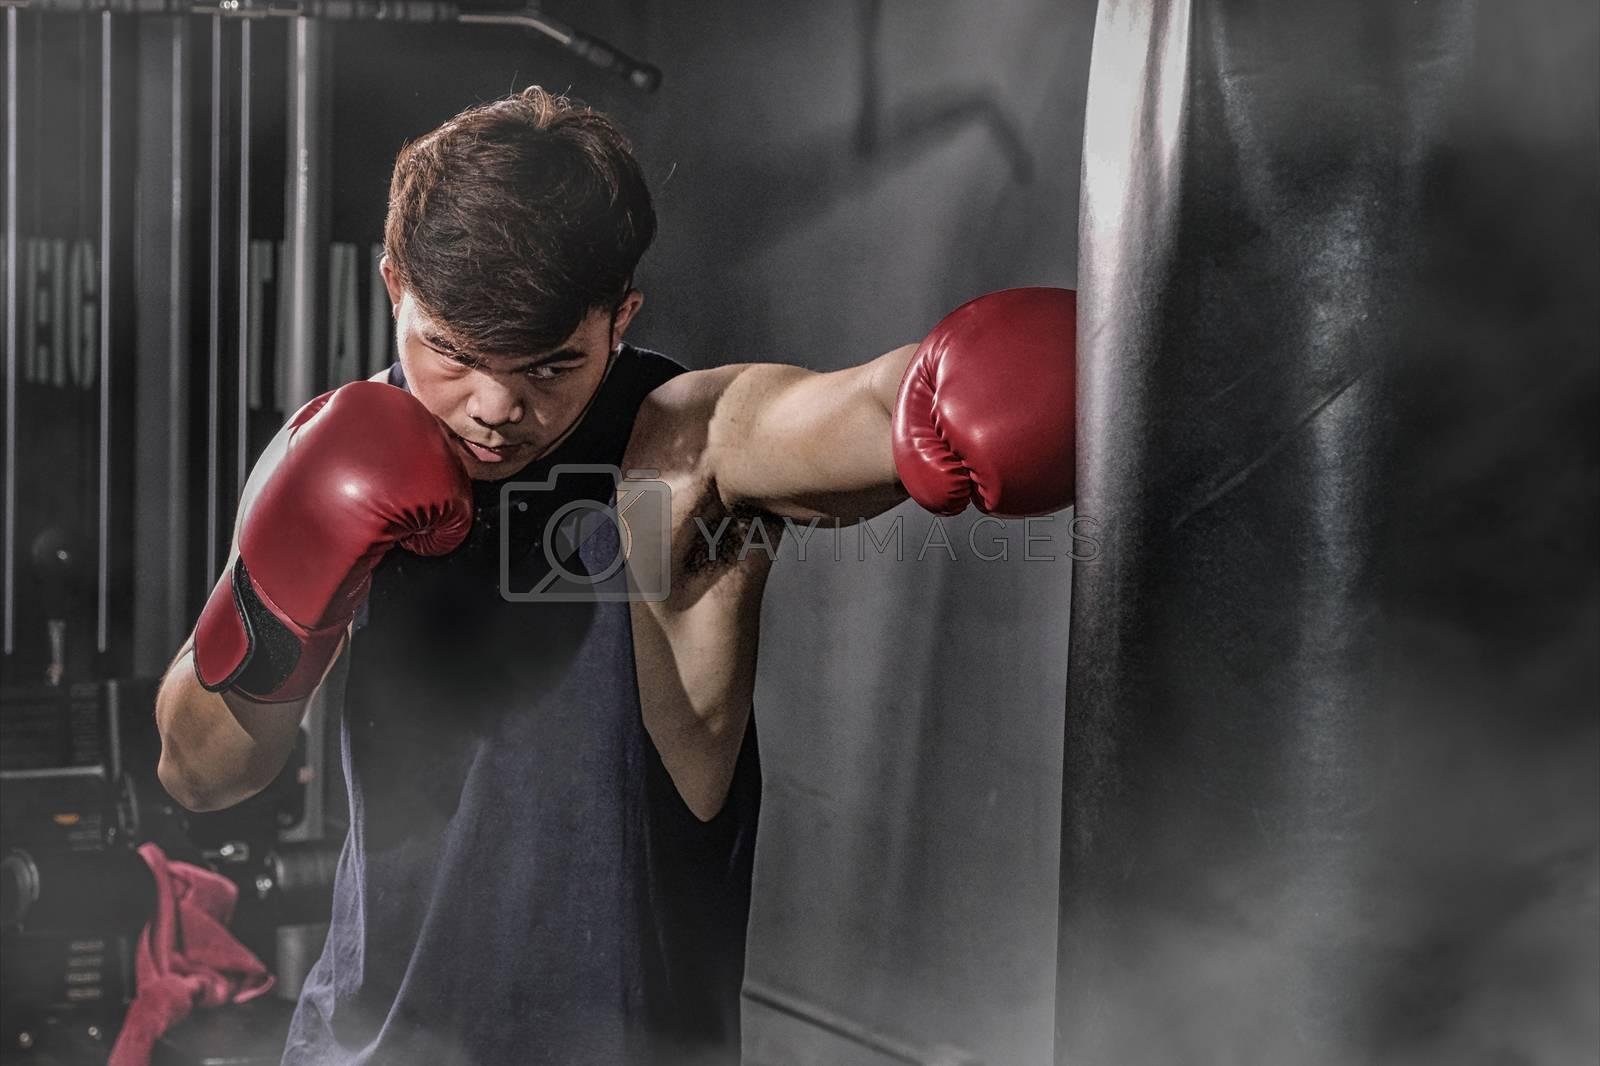 Boxer hitting a huge punching bag at a boxing studio